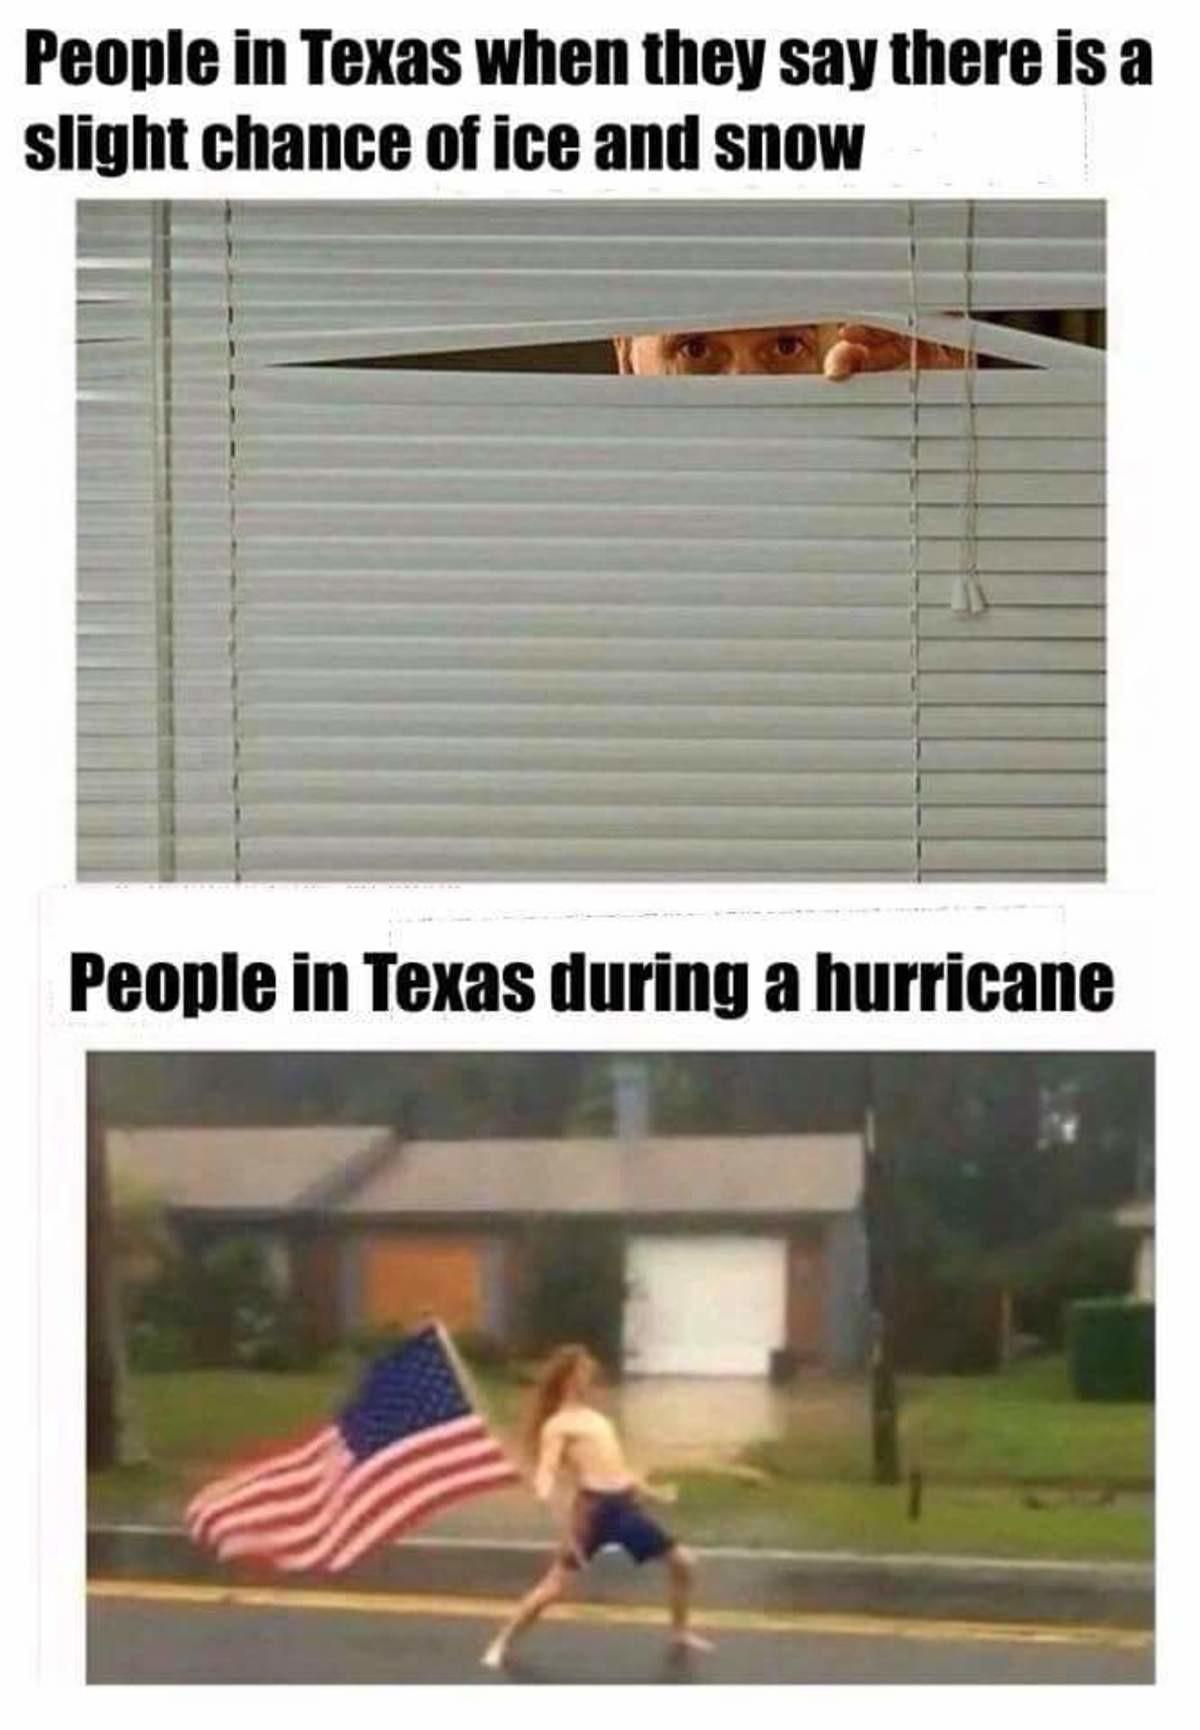 Texan+hurricanes+vs+snow+large+mentionlist+texas_91c8e1_6492832 texan hurricanes vs snow